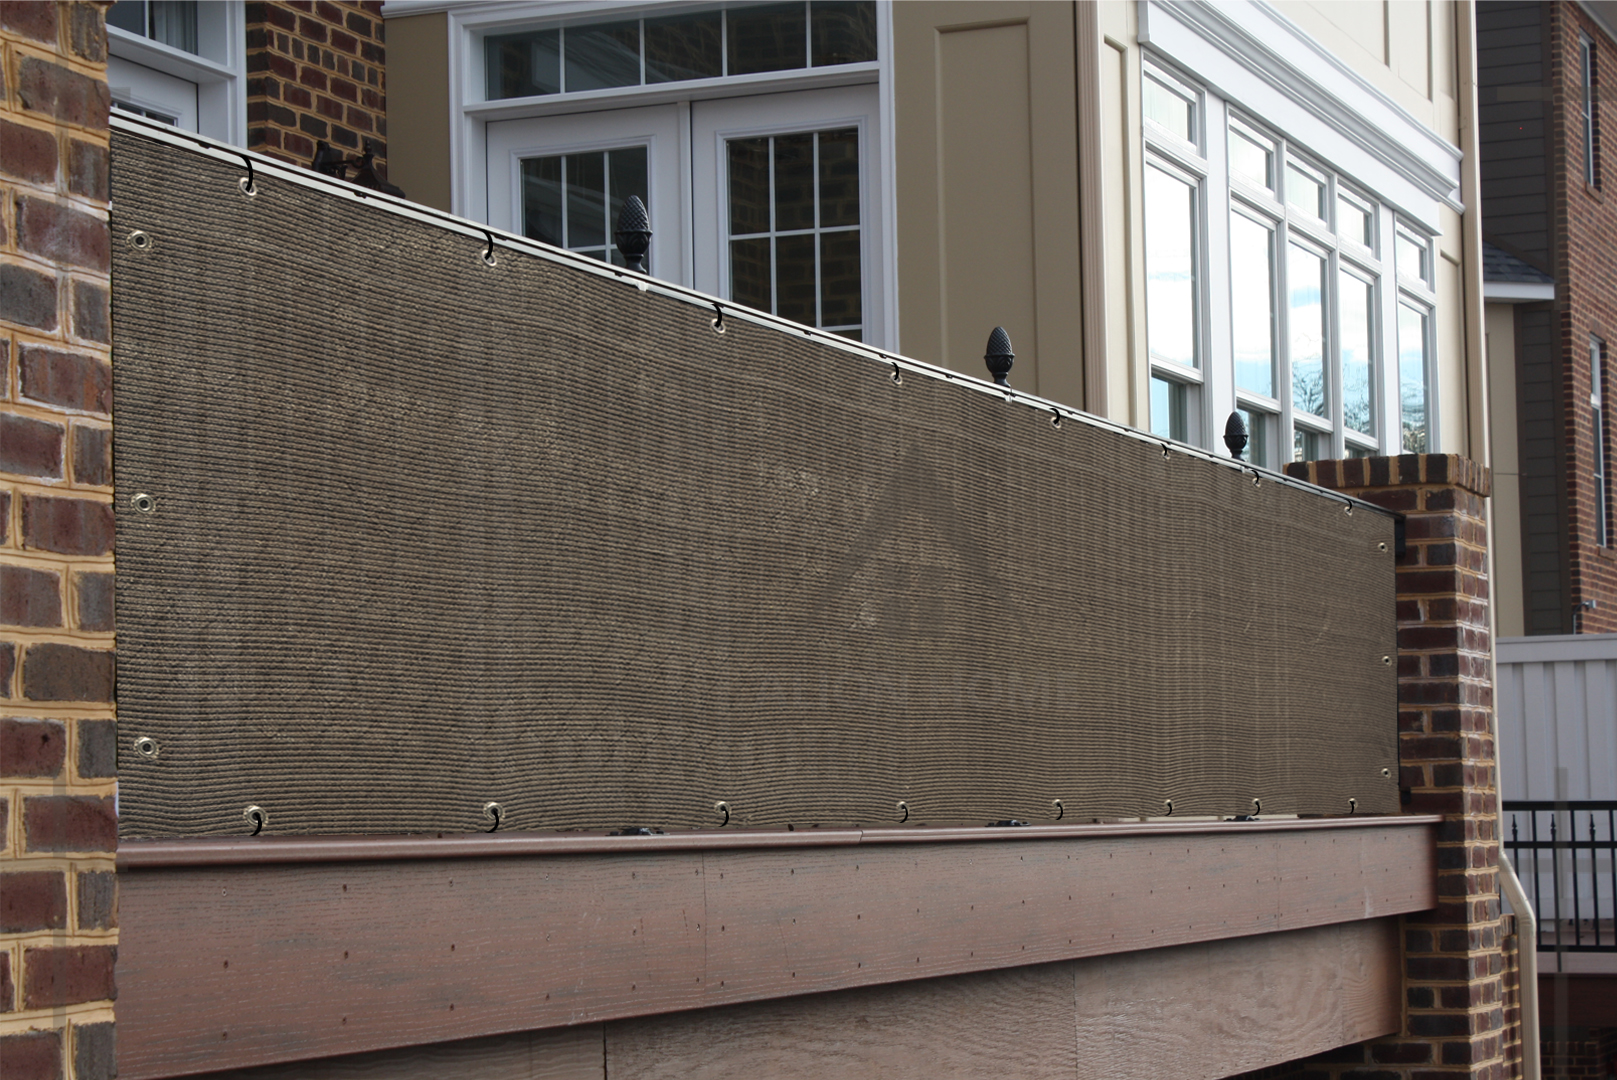 4 x 50 Alion Home Elegant Privacy Screen Fence Mesh Windscreen for Backyard Deck Patio Balcony Pool Porch Railing Brown//Mocha